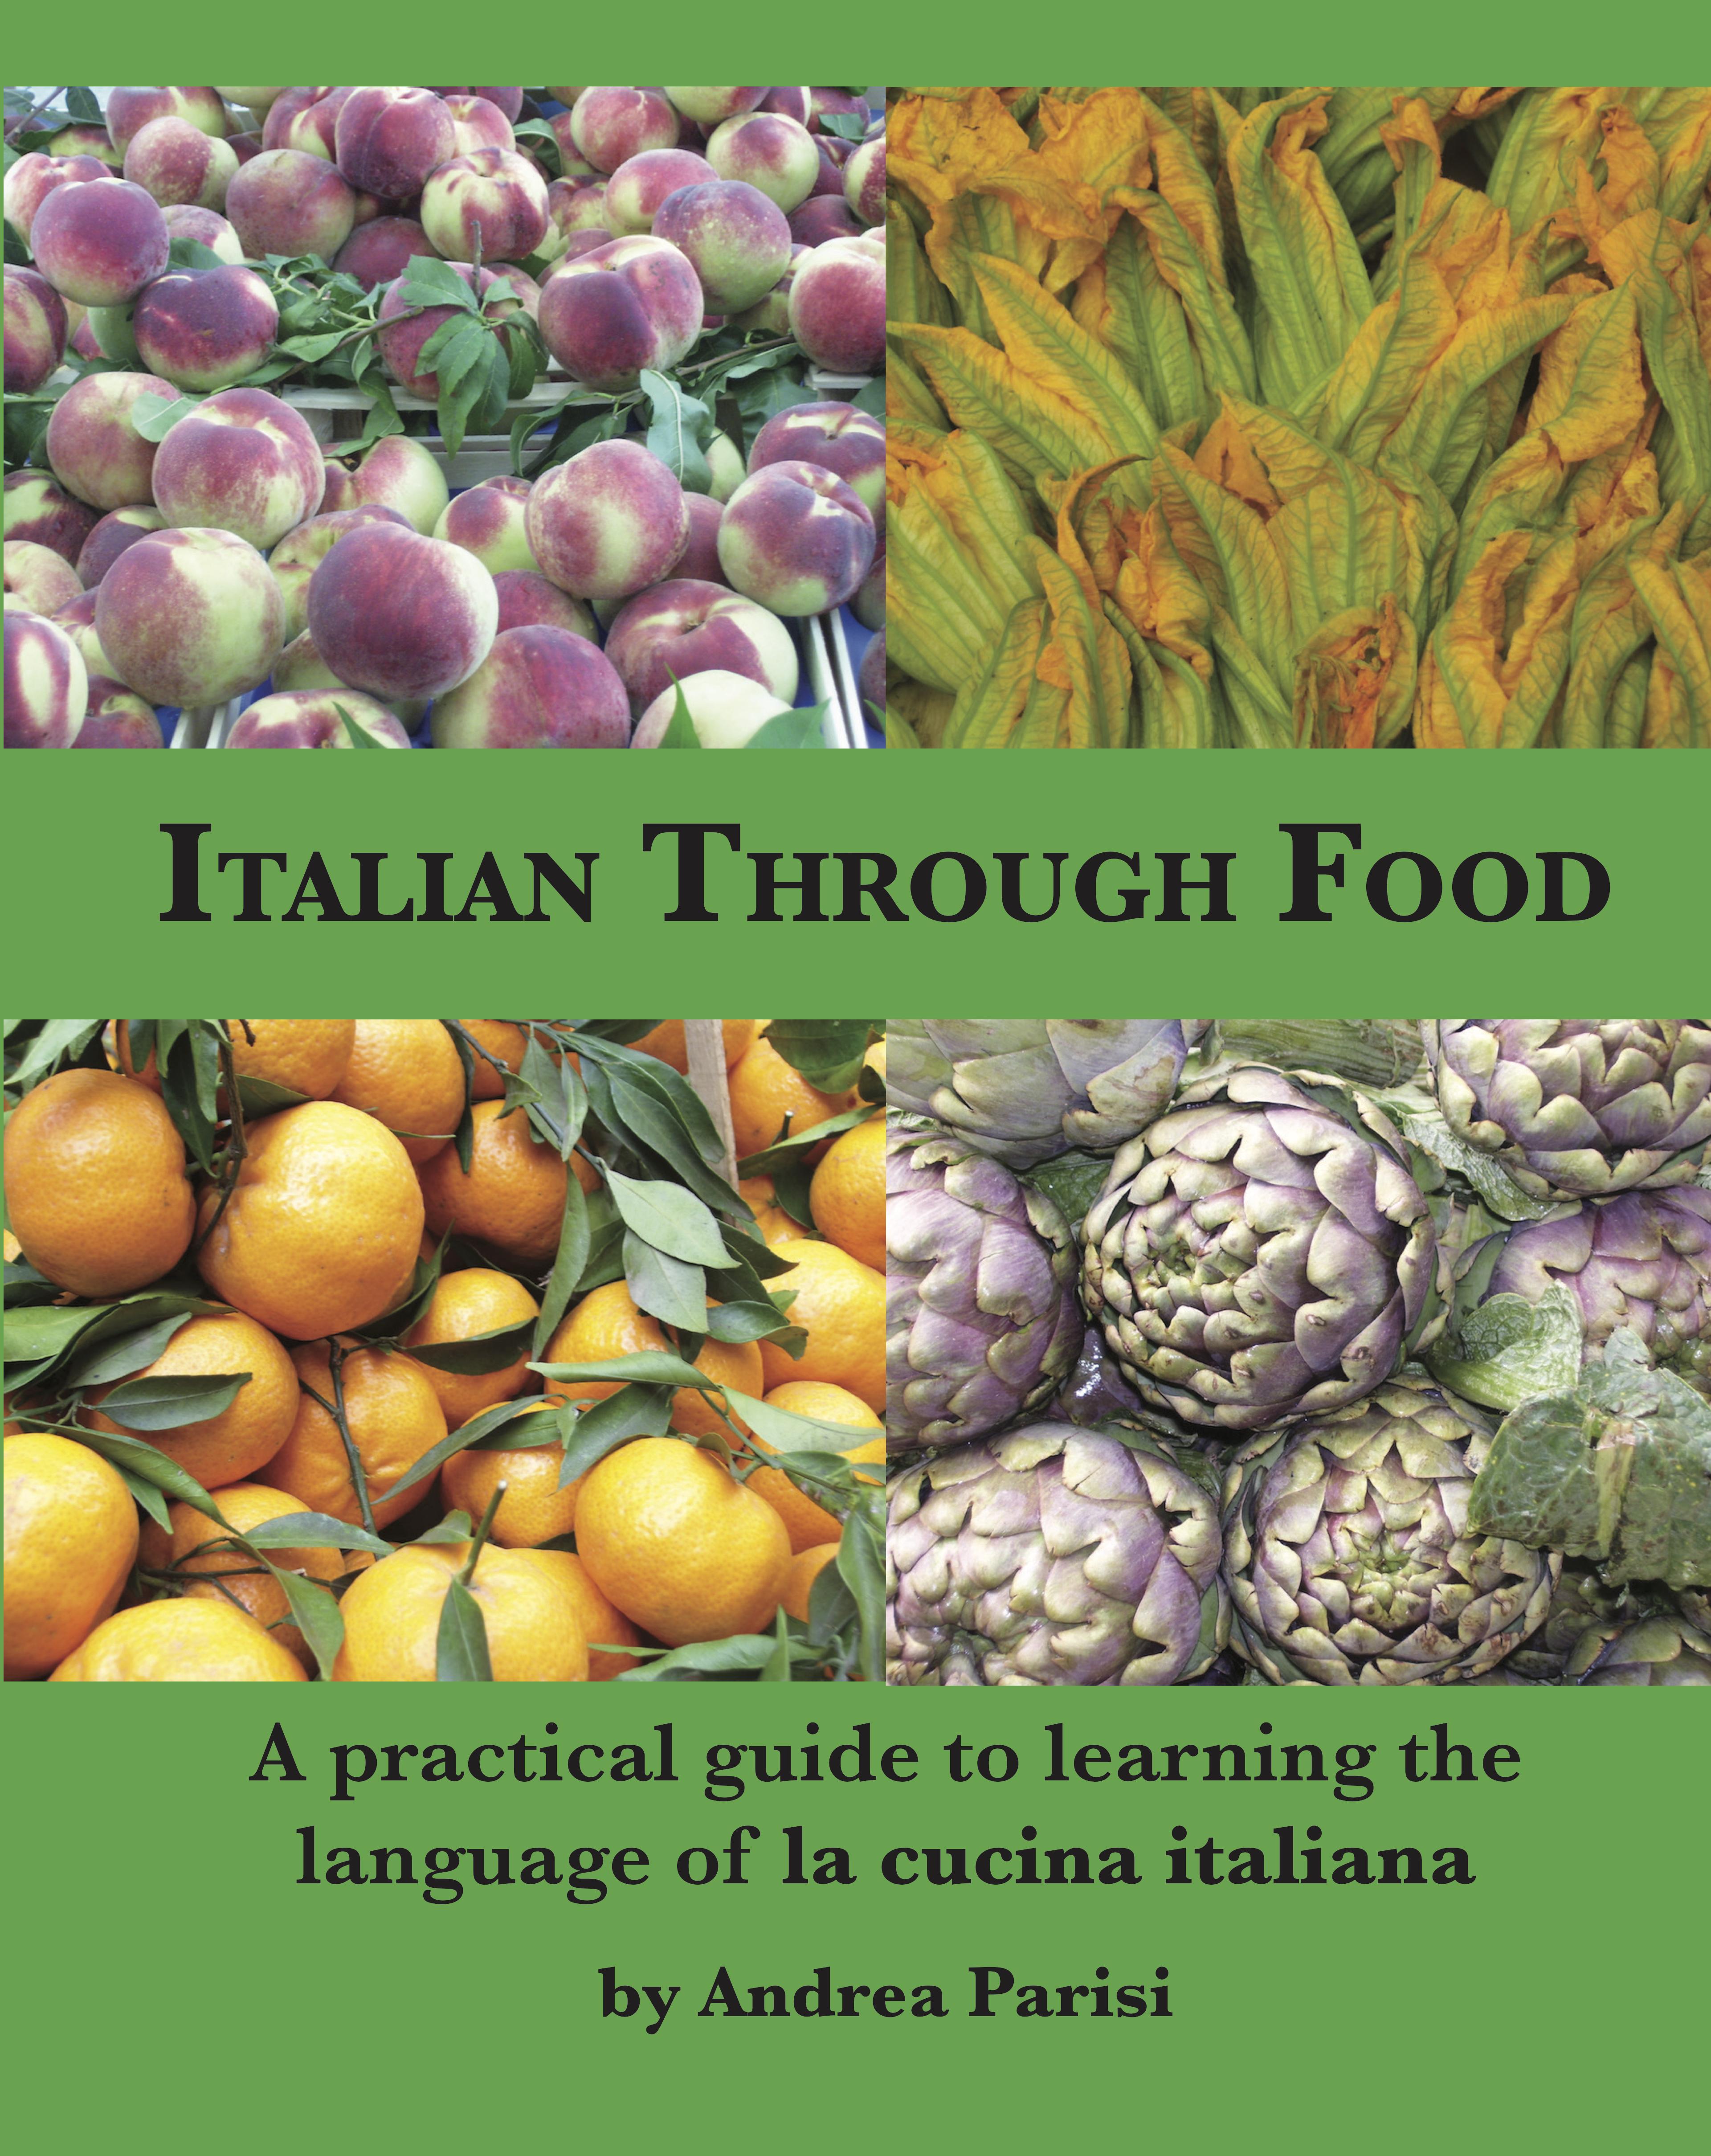 Italian Through Food Learn The Language Of La Cucina Italiana